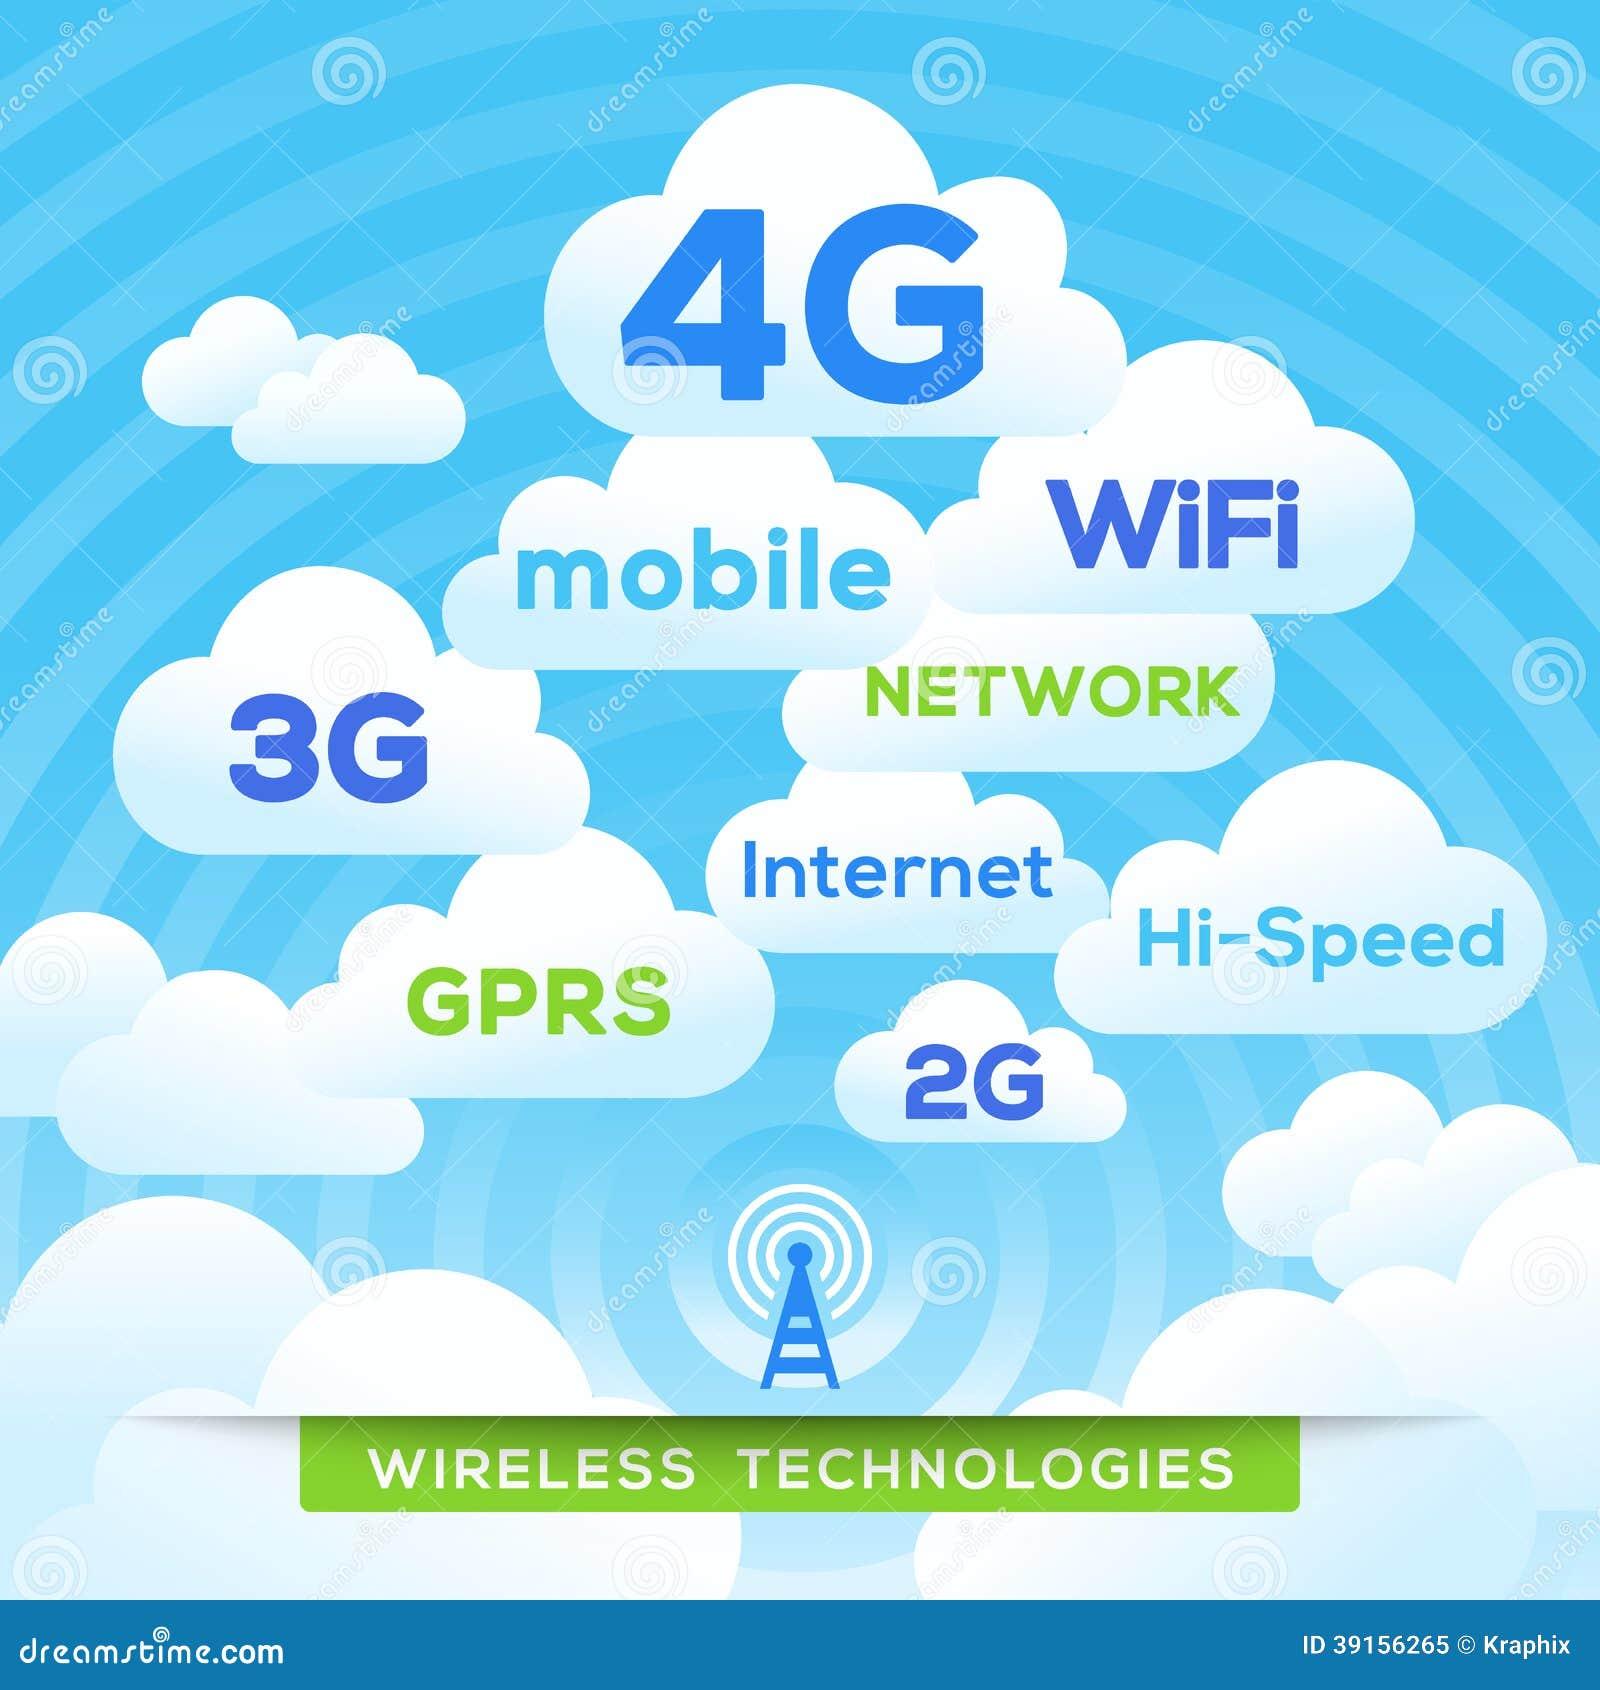 Wireless Technologies 4G LTE Wifi WiMax 3G HSPA+